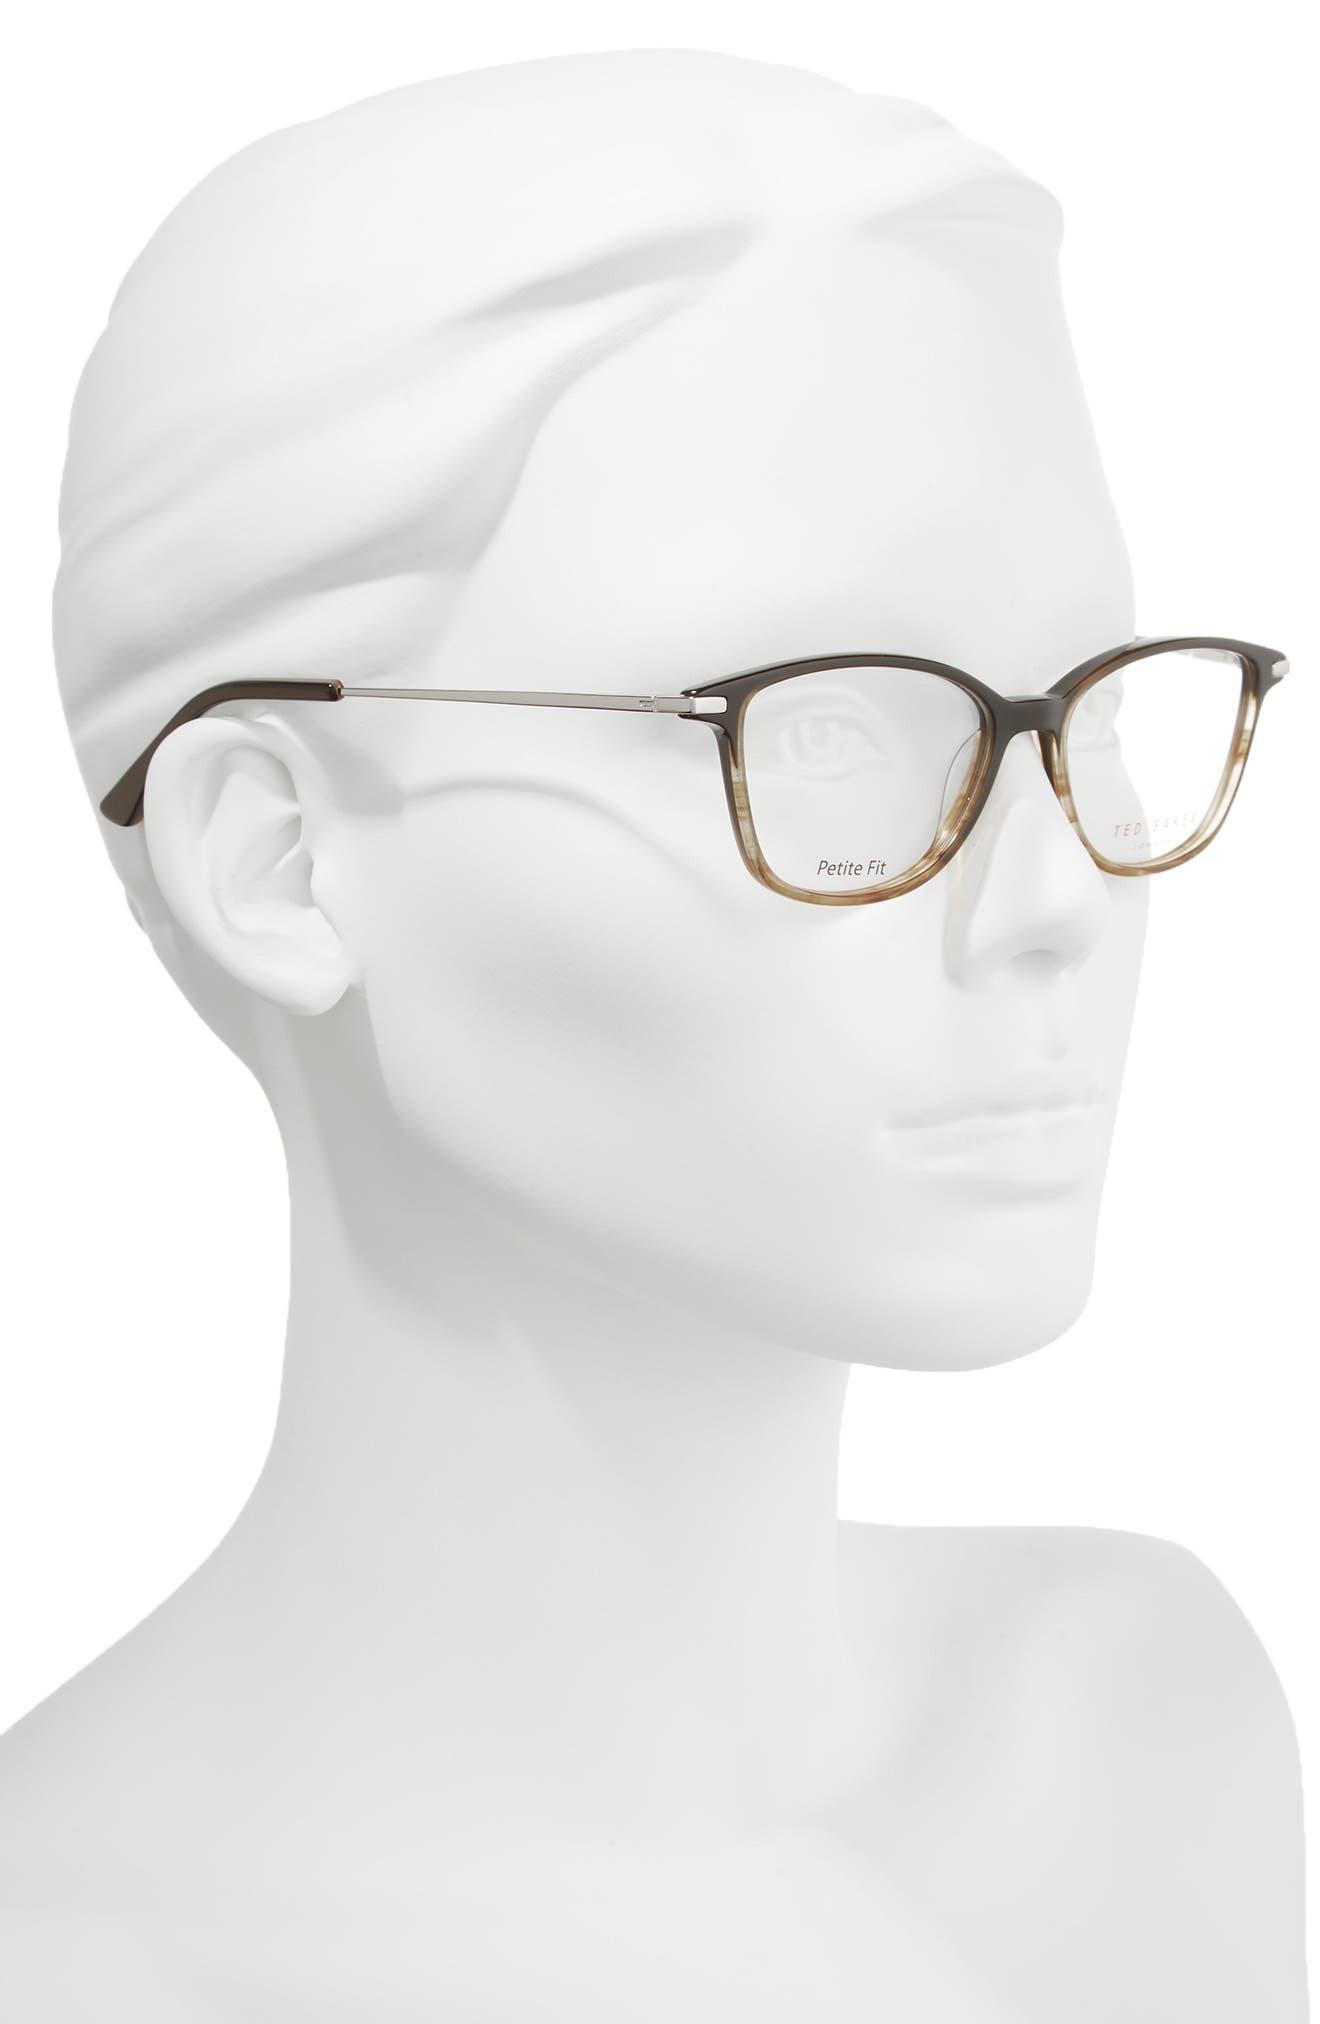 Alternate Image 2  - Ted Baker London Petite Fit 50mm Optical Glasses